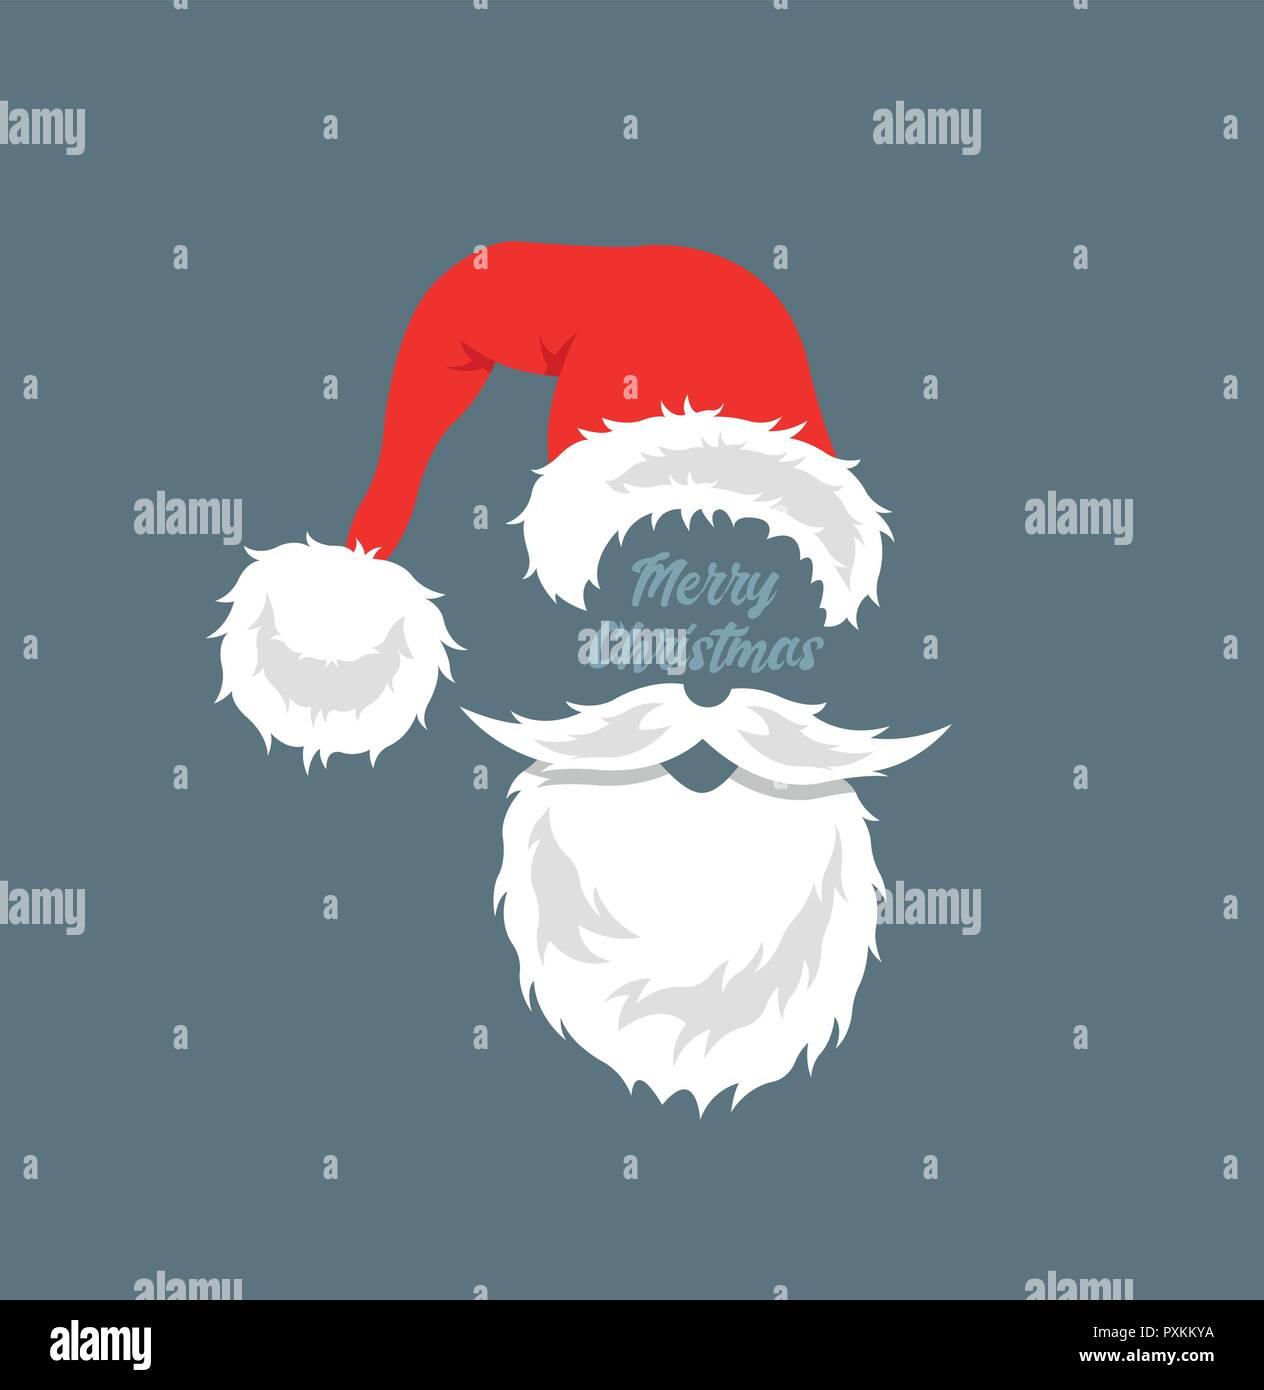 Christmas Celebration Cartoon Images.Santa Claus Cartoon With Christmas Celebration All The